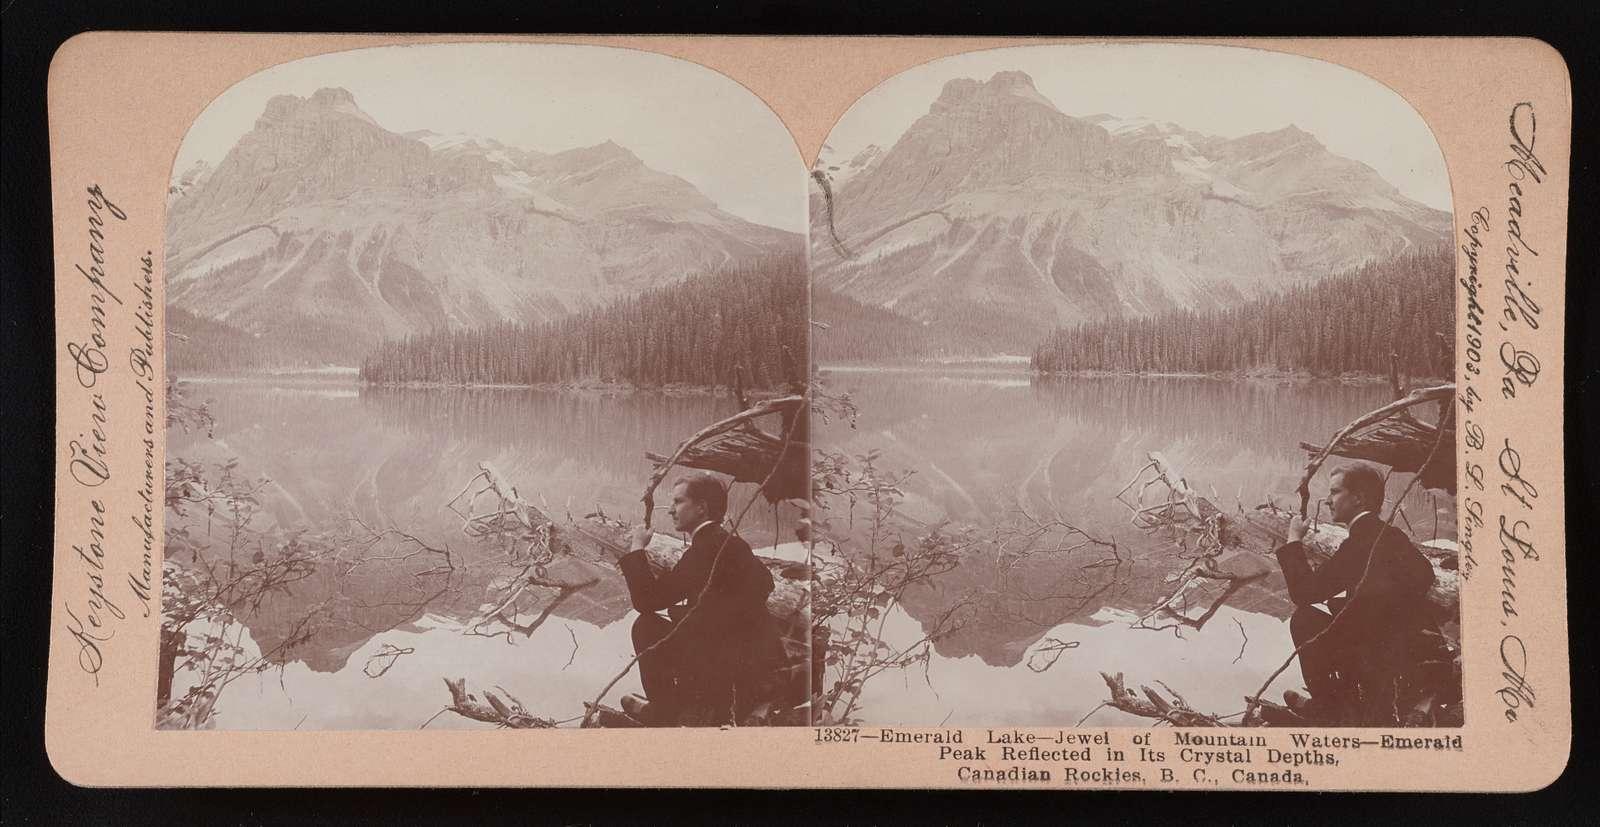 Emerald Lake-jewel of mountain waters-Emerald Peak reflected in its crystal depths, Canadian Rockies, B.C., Canada